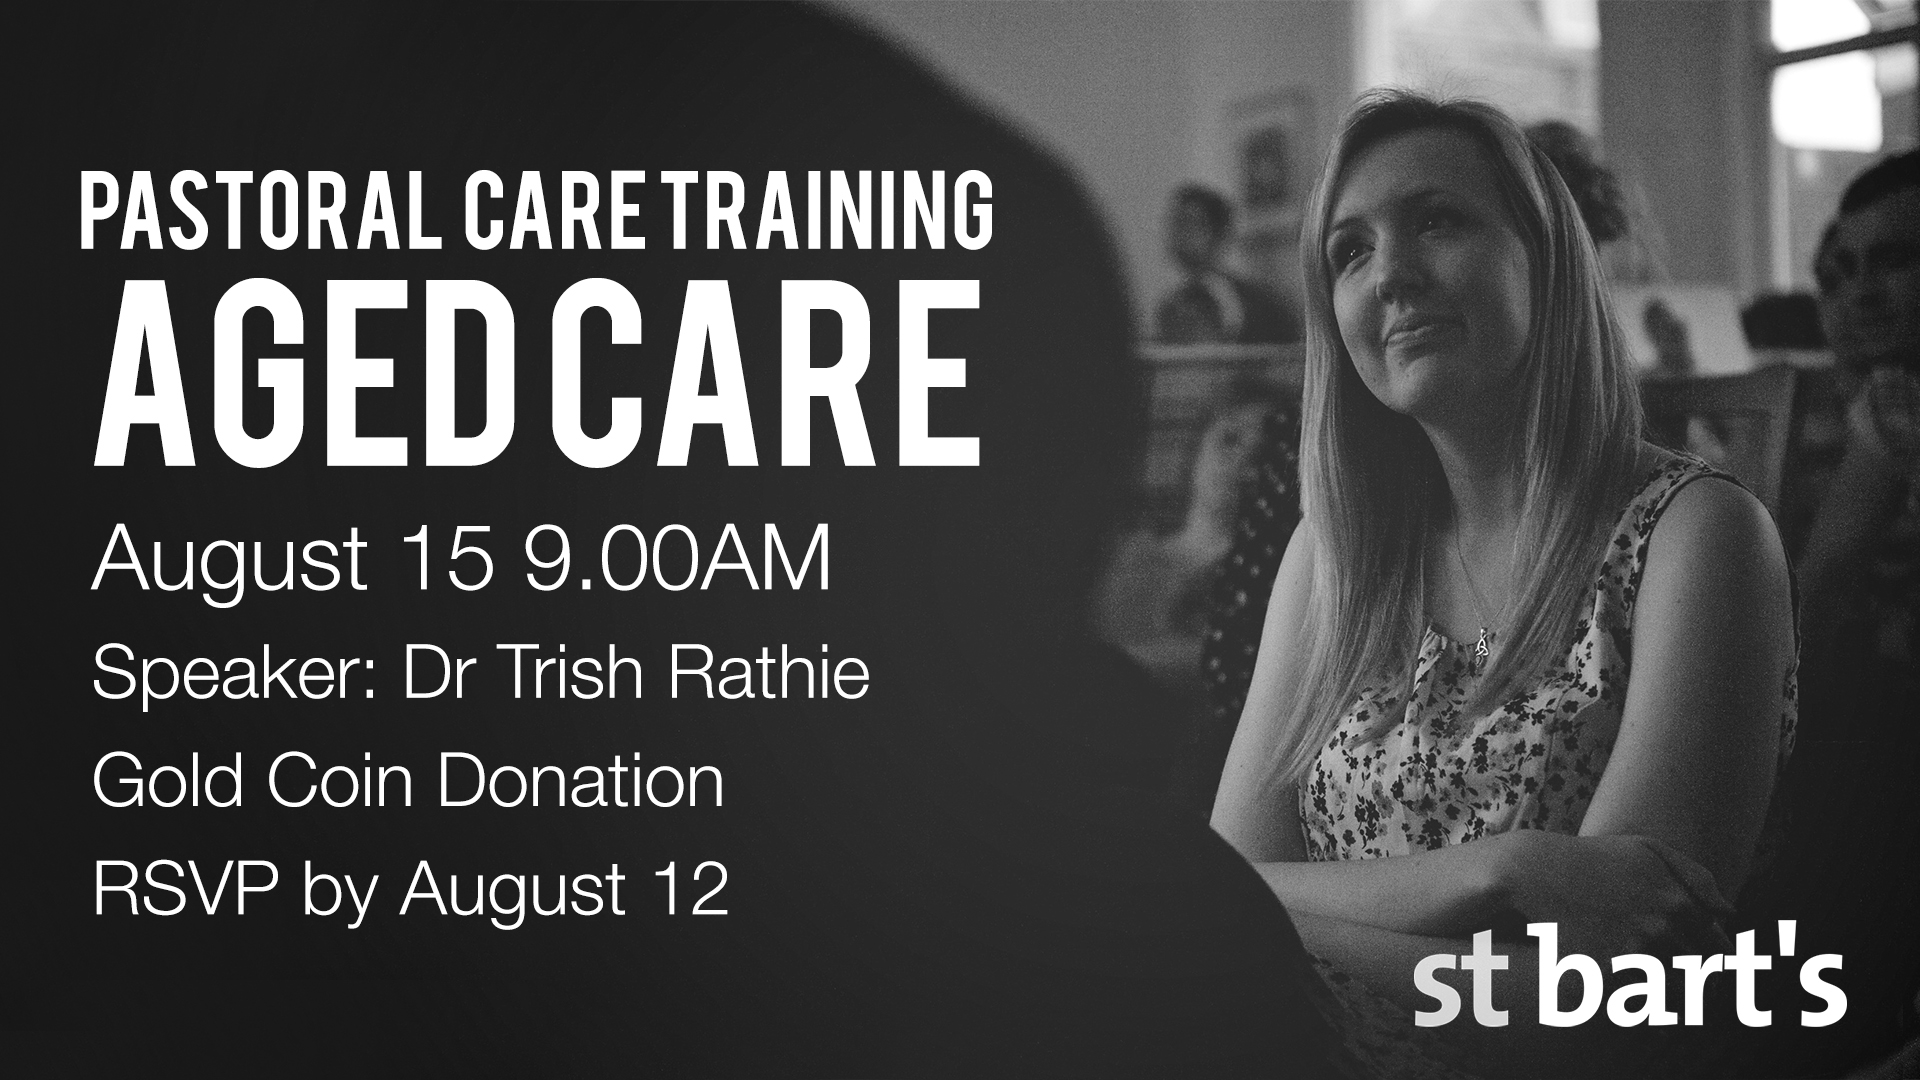 Aged-Care-Training.jpg